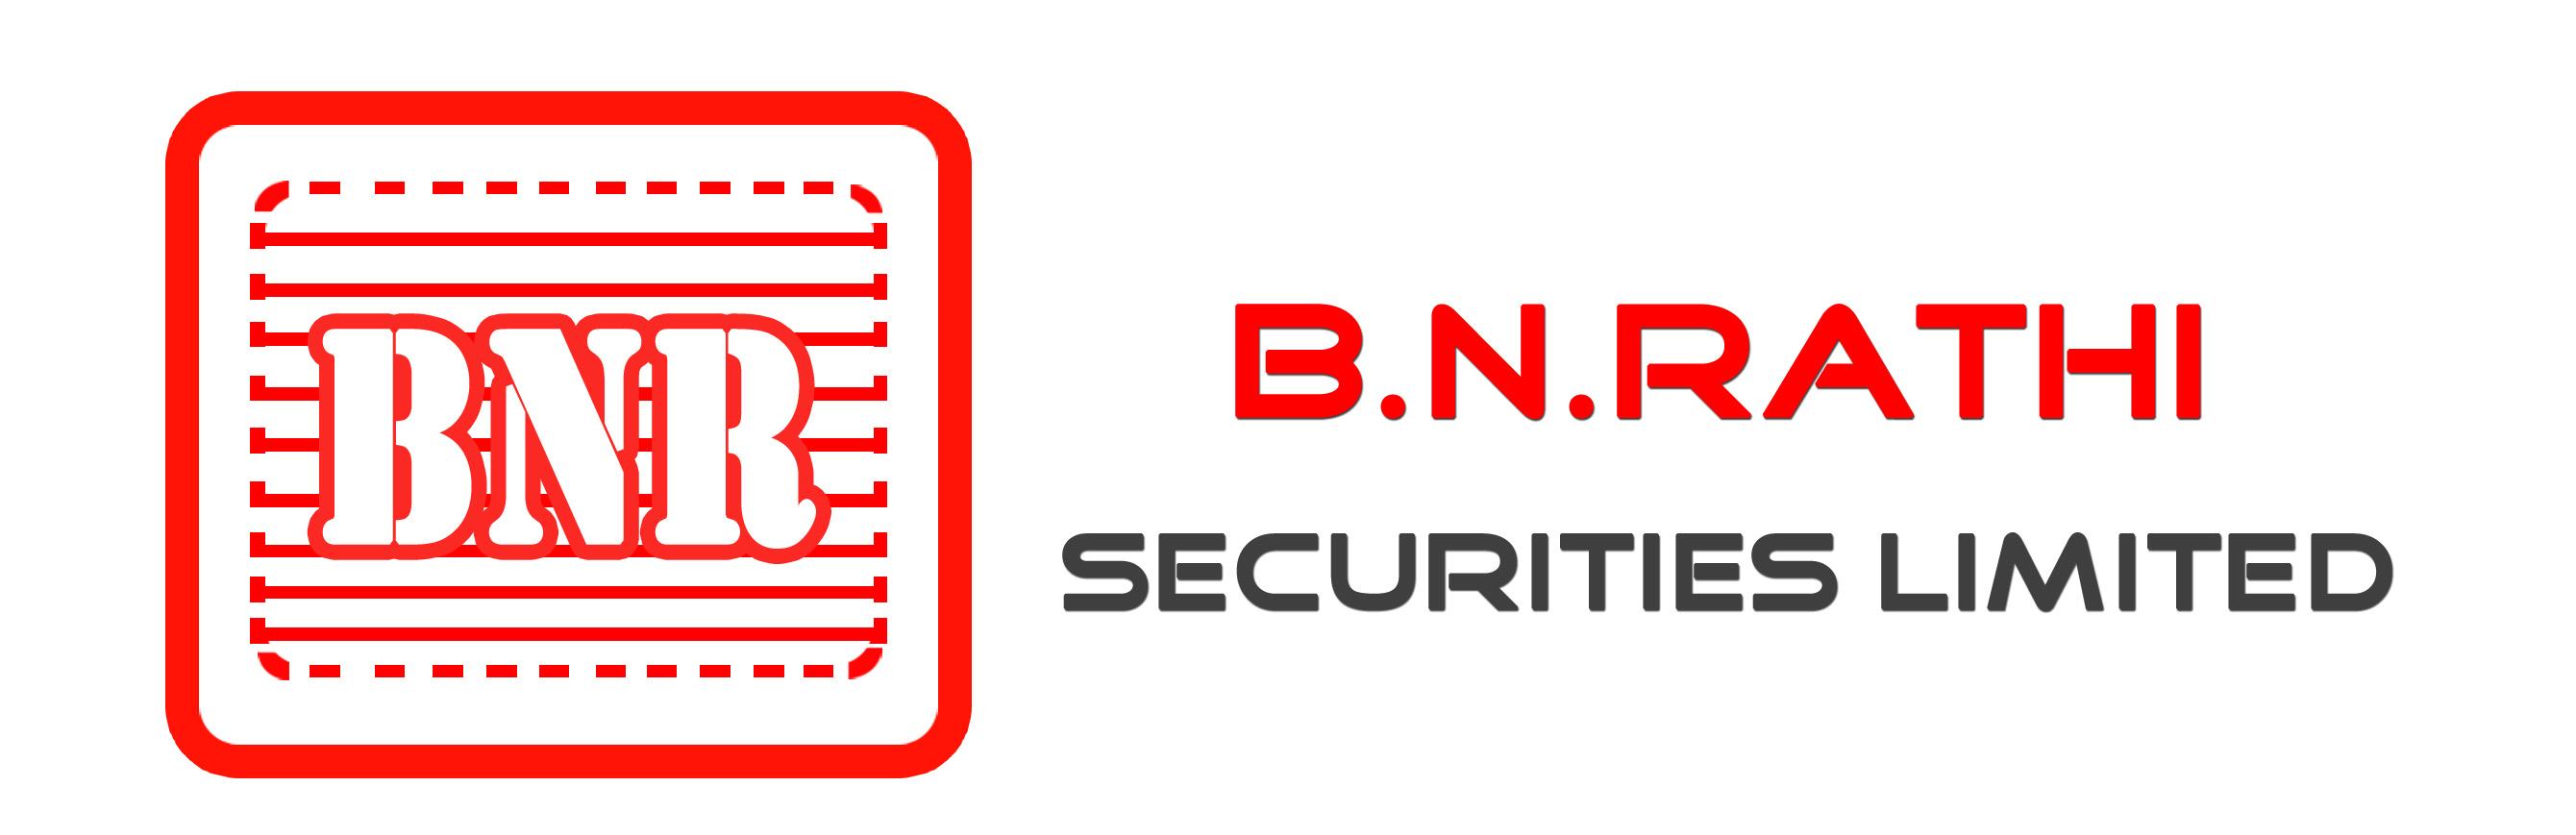 B N RATHI Securities Ltd. Aadhar Upload Form